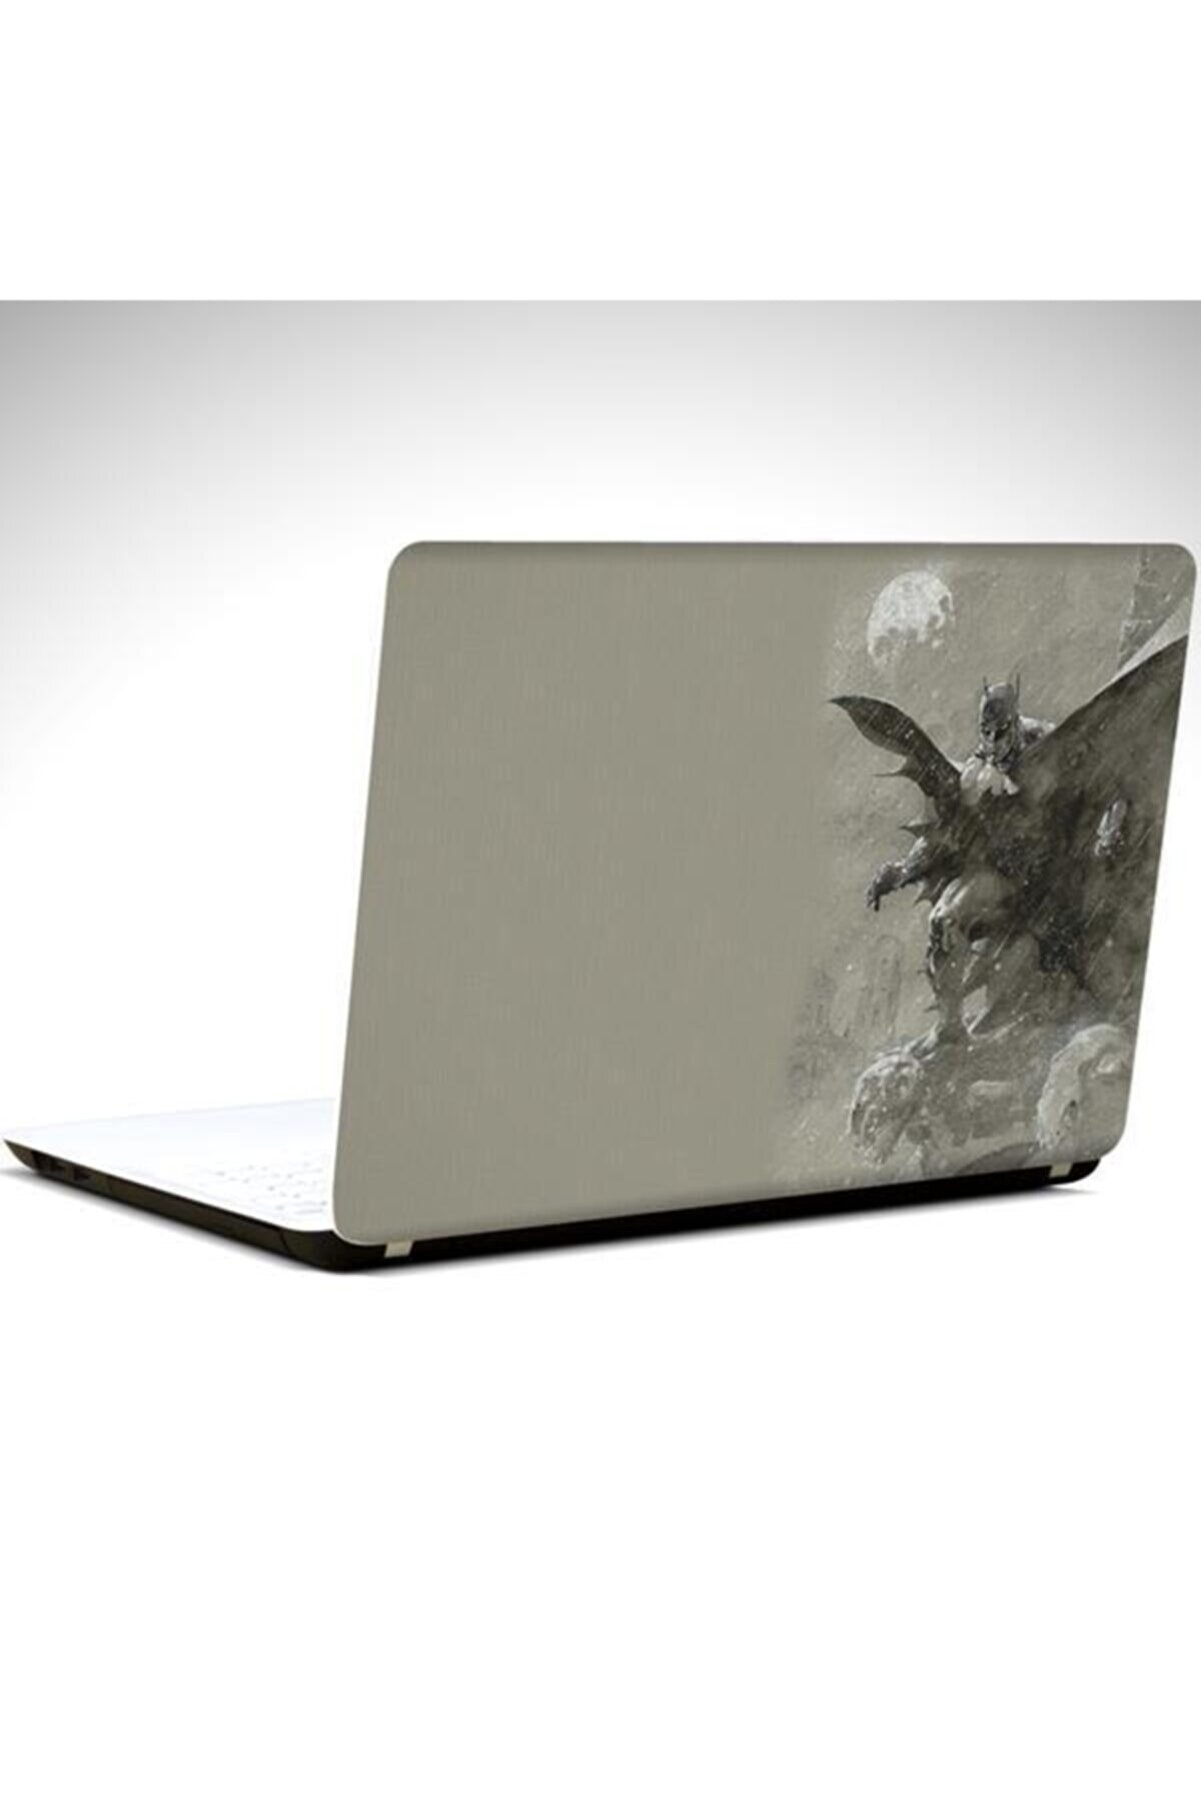 Dekolata Batman Laptop Sticker Laptop 19 Inch (40,5x27 cm)